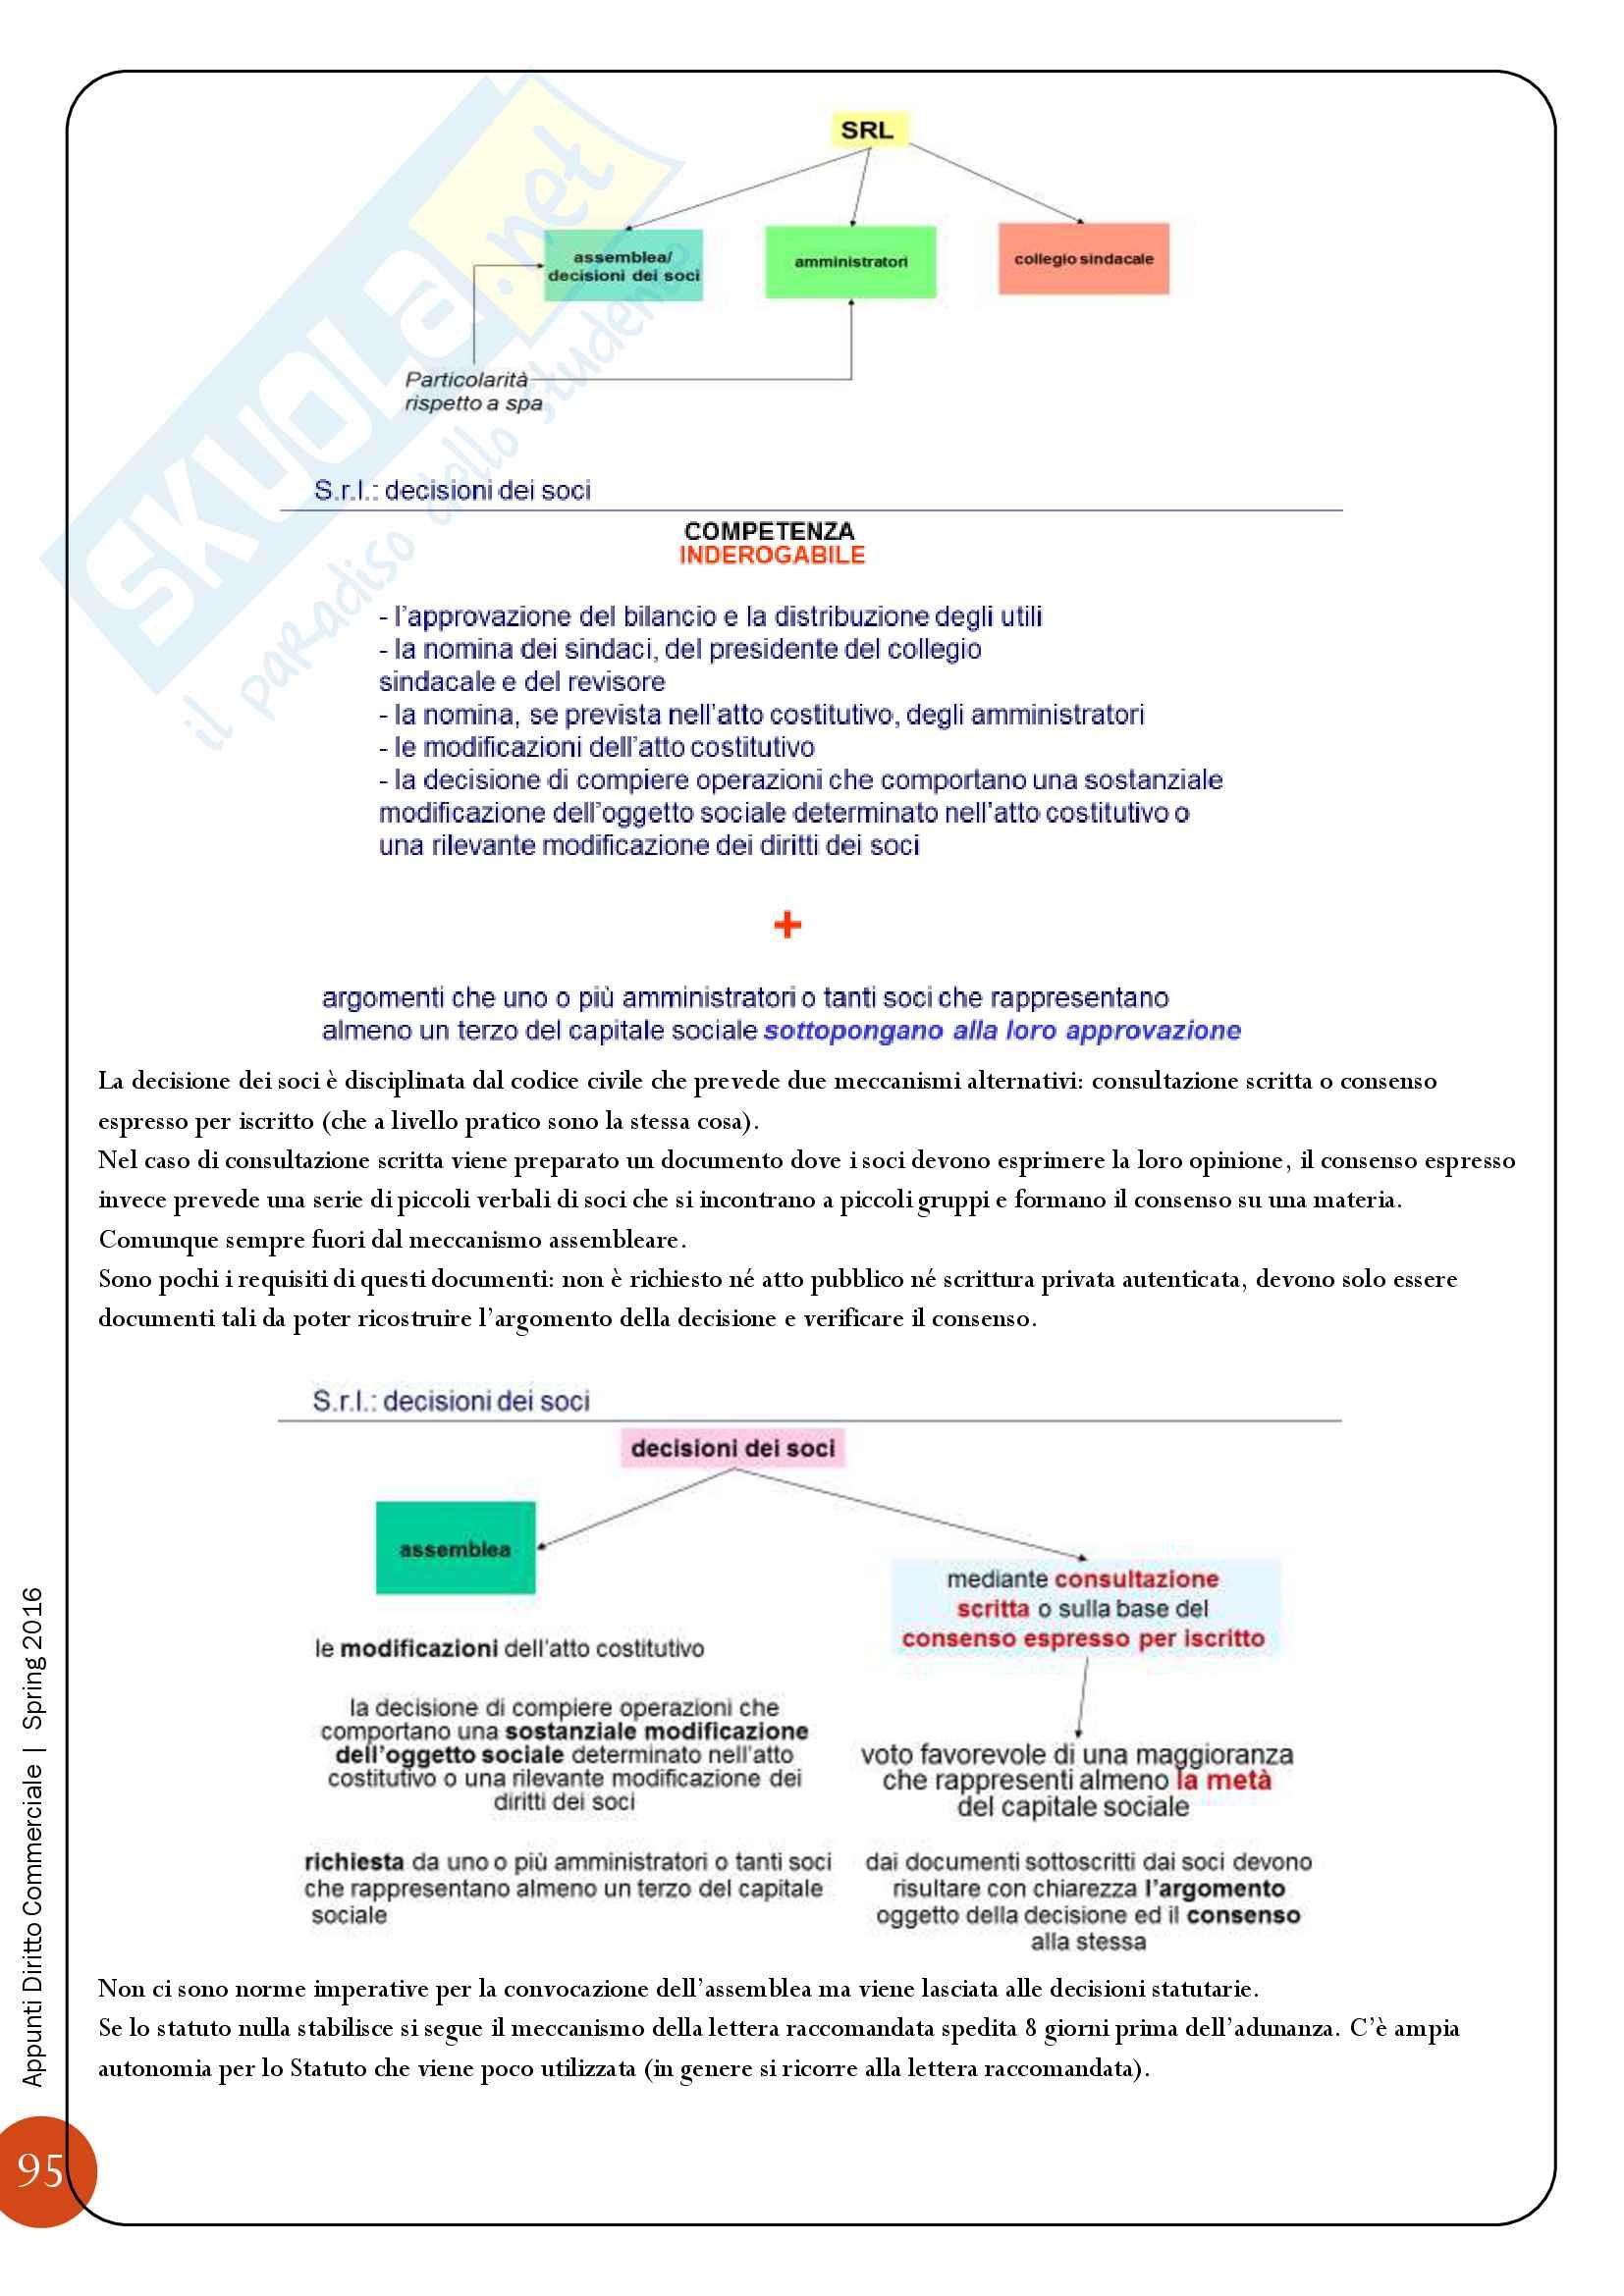 Diritto Commerciale - Appunti Pag. 96